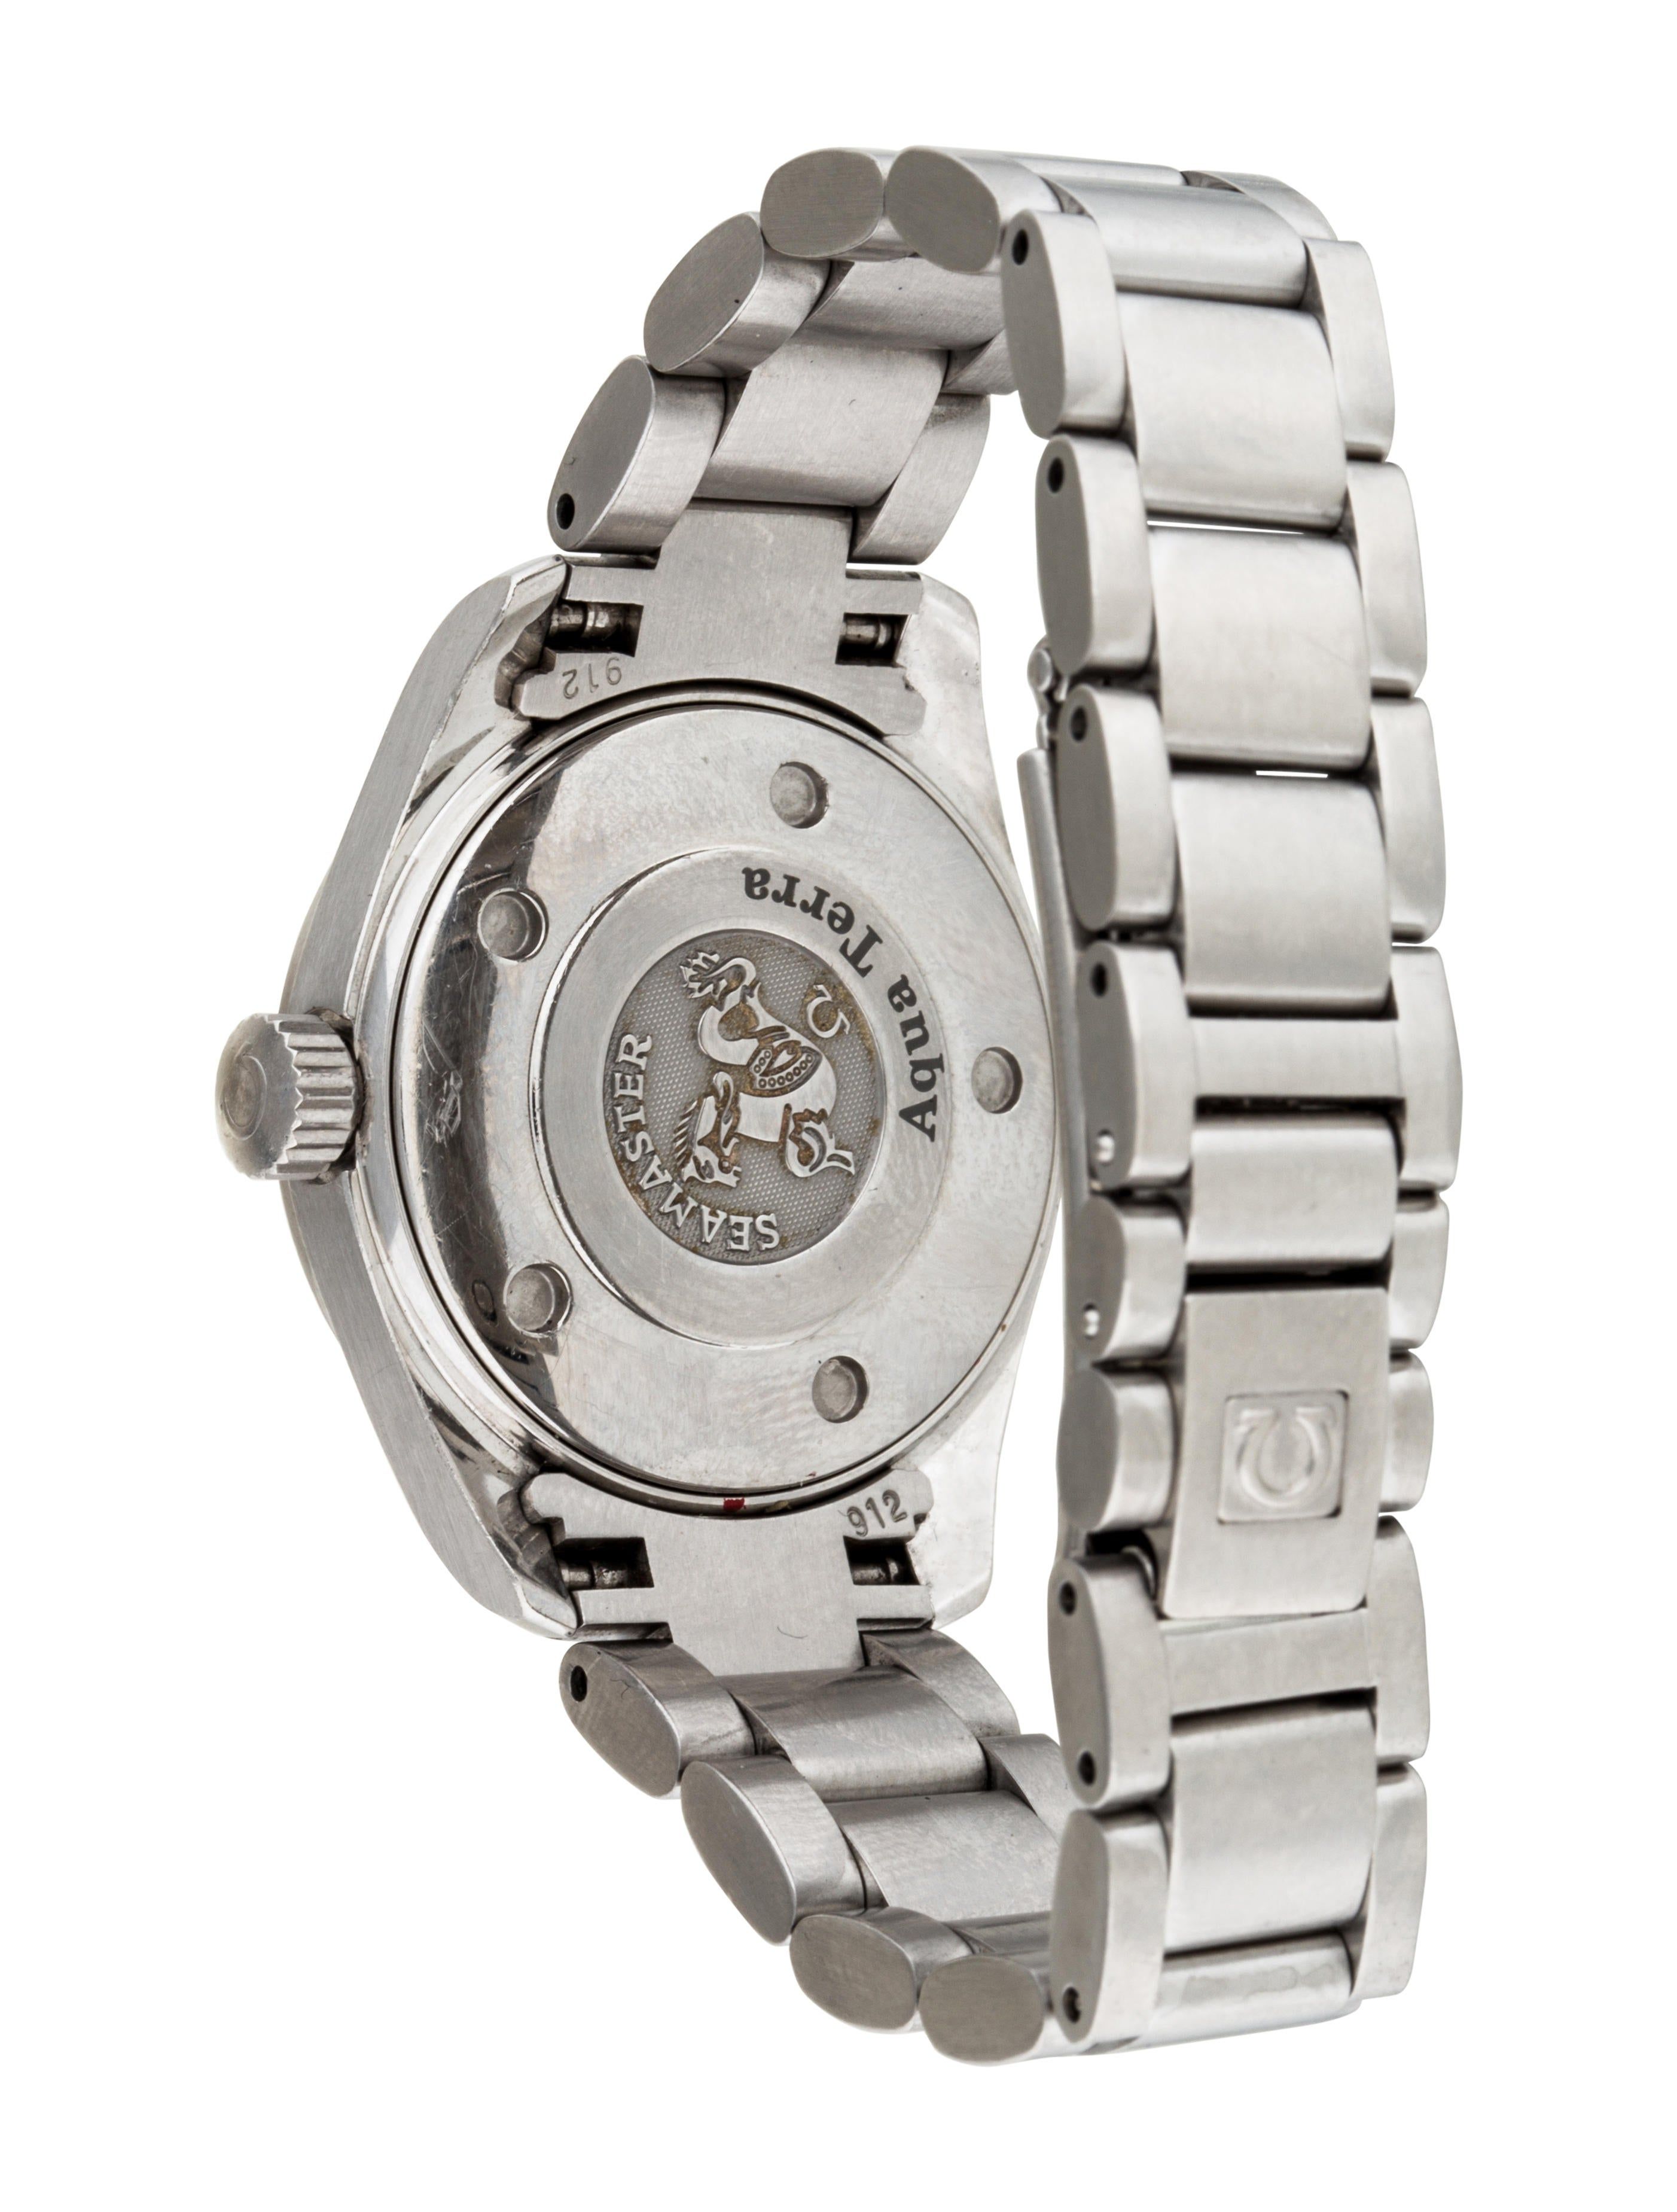 Omega aqua terra watch bracelet omg20591 the realreal for Aqua marine watches